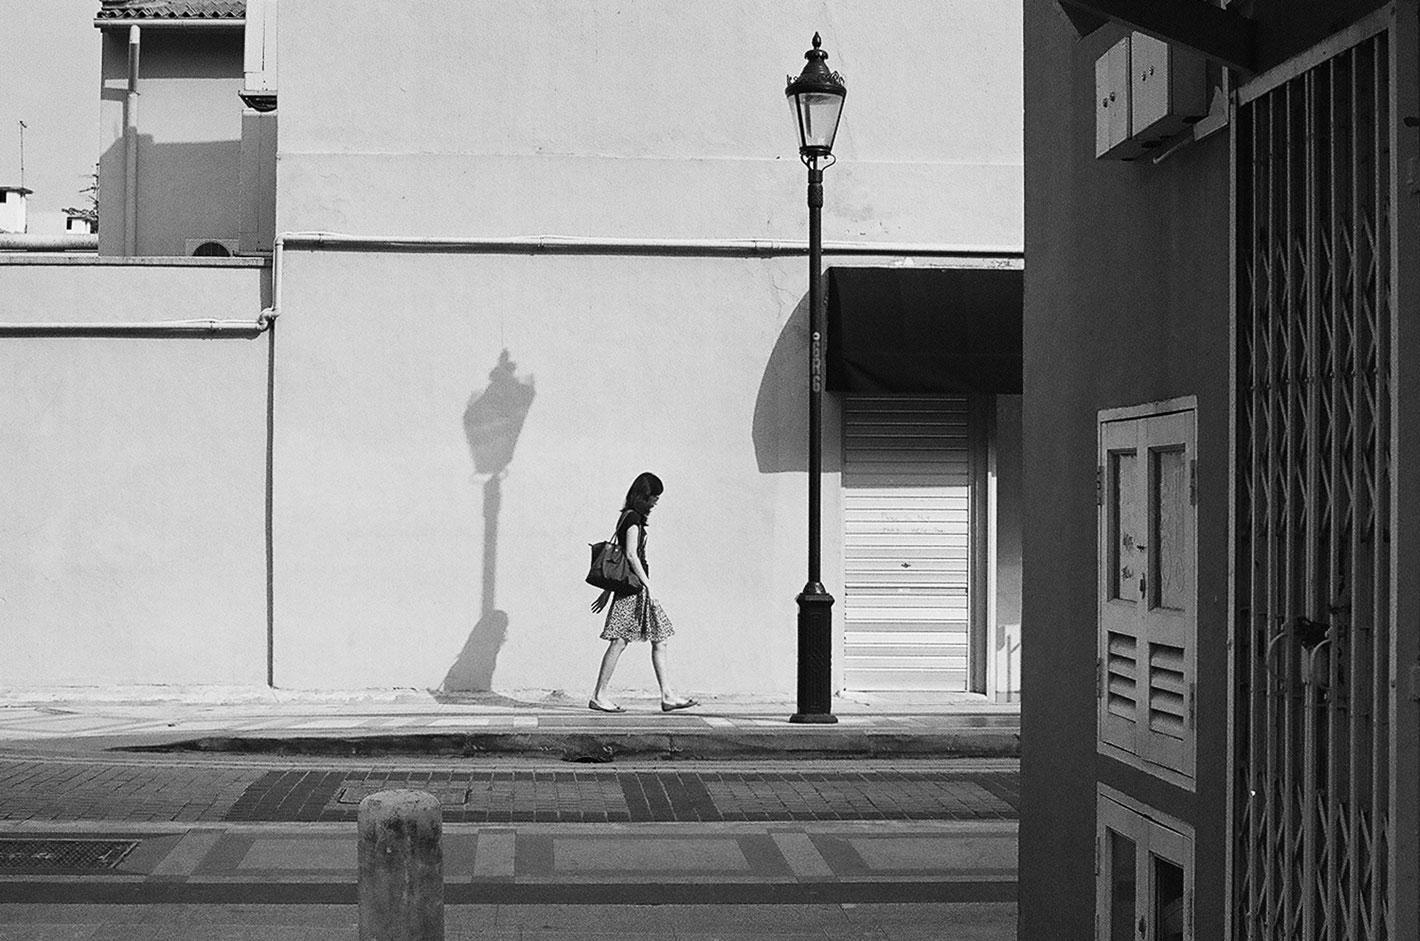 Street Photography - Bali Street Photgorapher